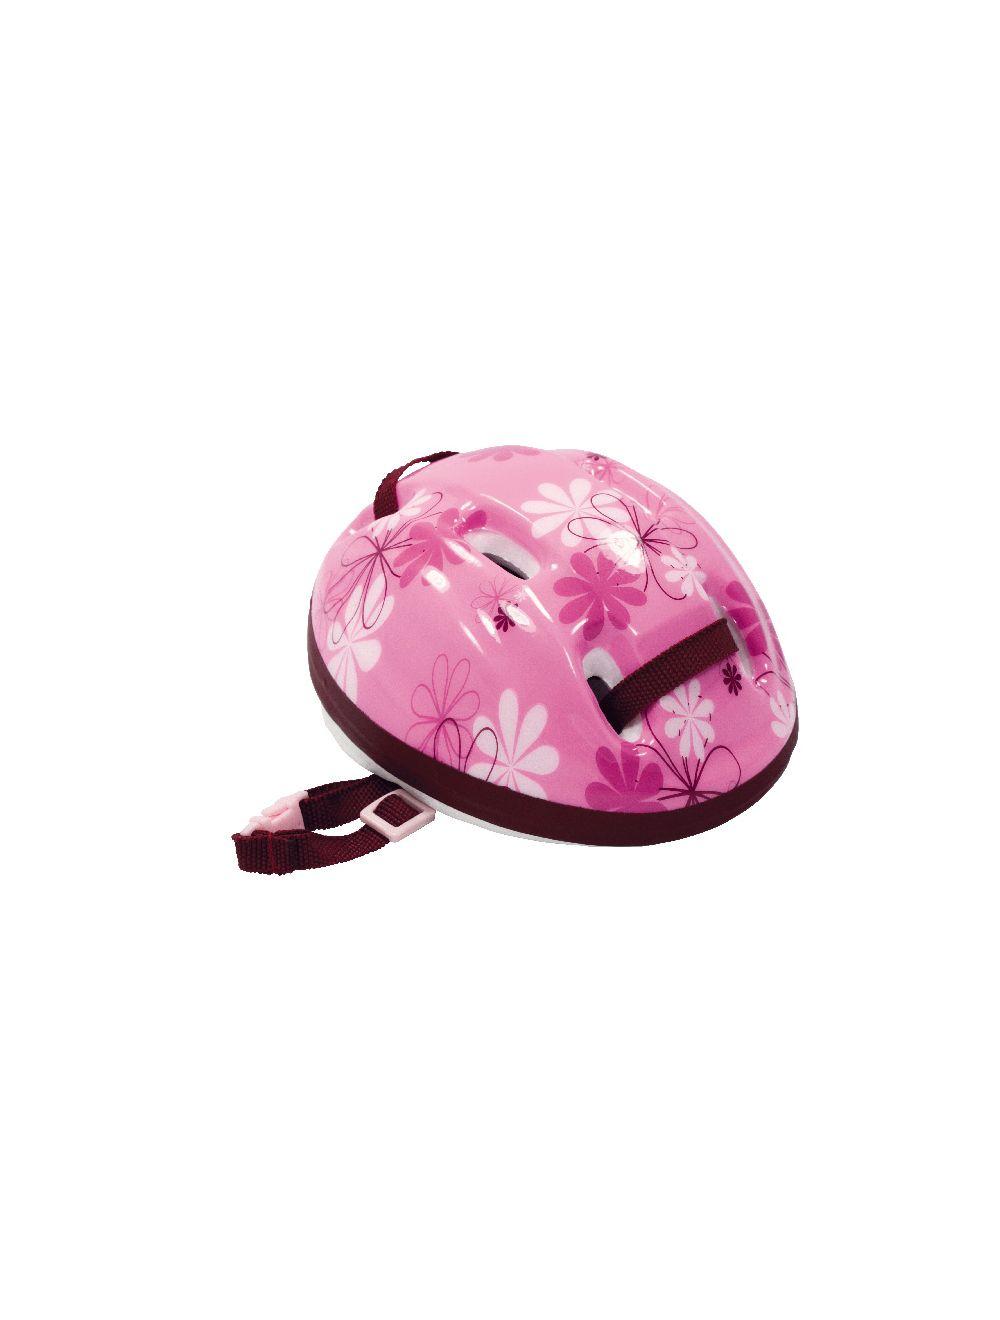 Nuku jalgrattakiiver roosa 42-50 Götz